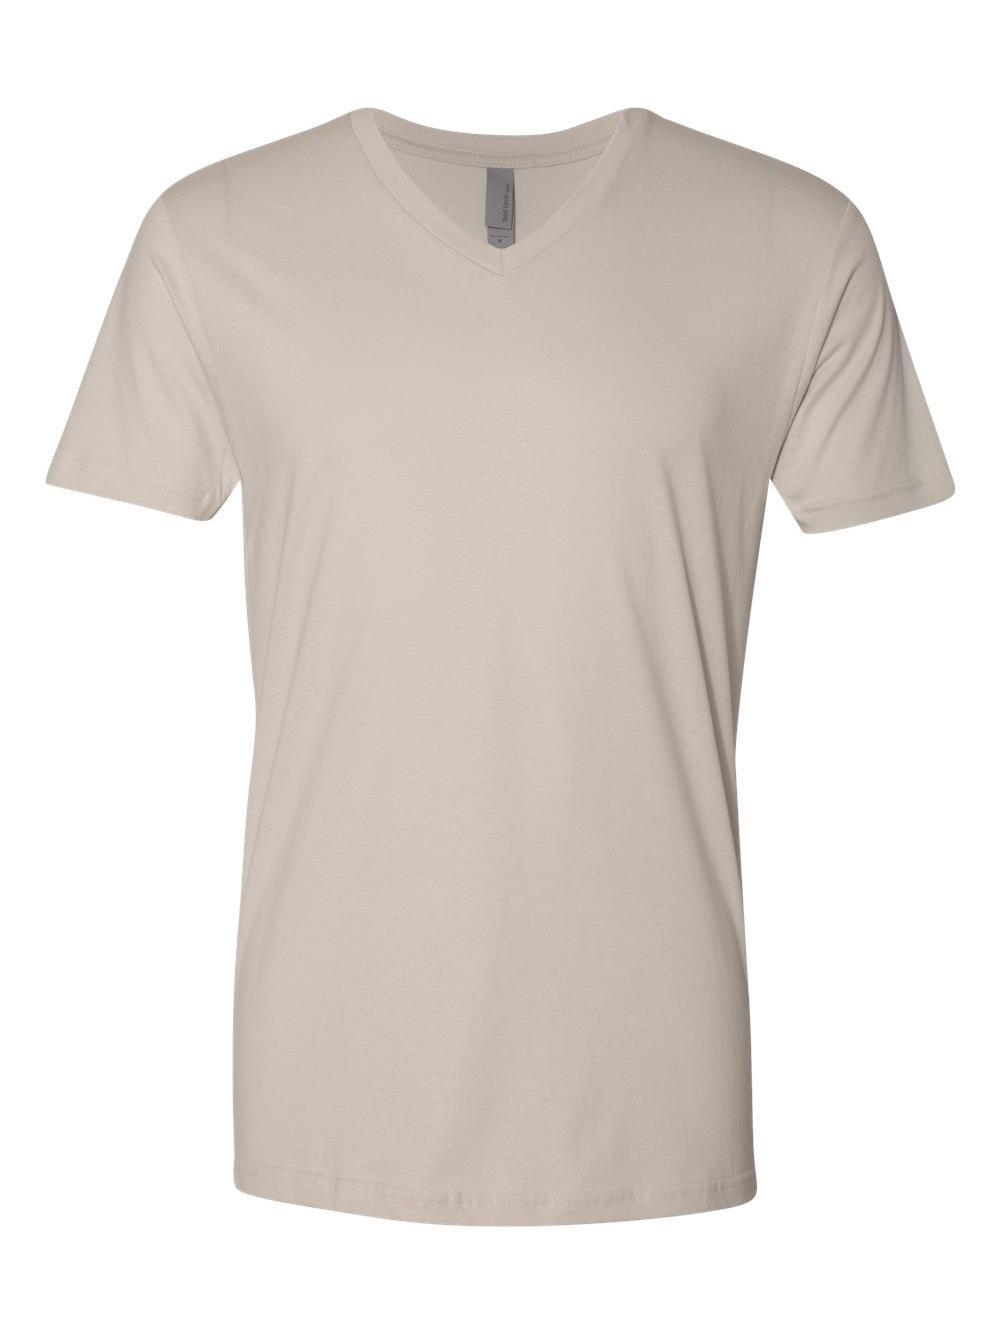 Next-Level-Premium-Short-Sleeve-V-3200 thumbnail 36